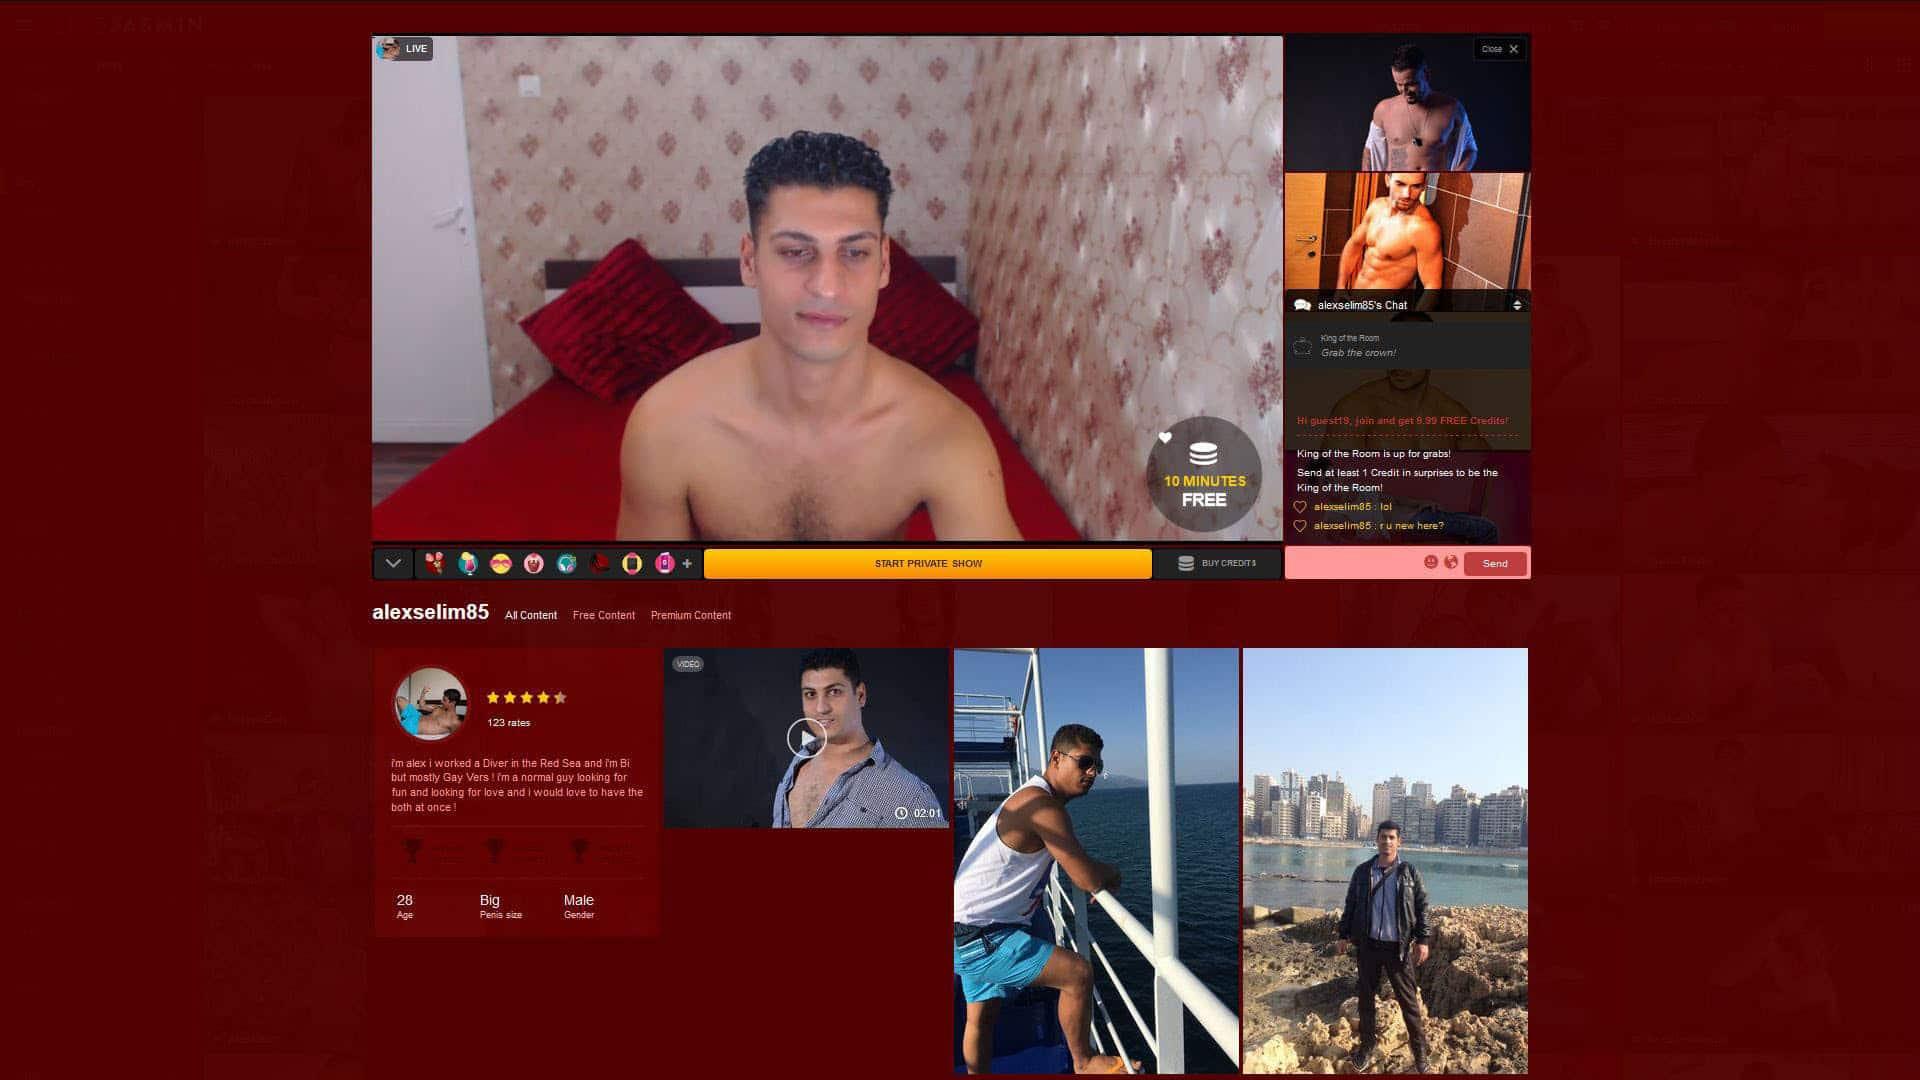 LiveJasminGay Alexselim85